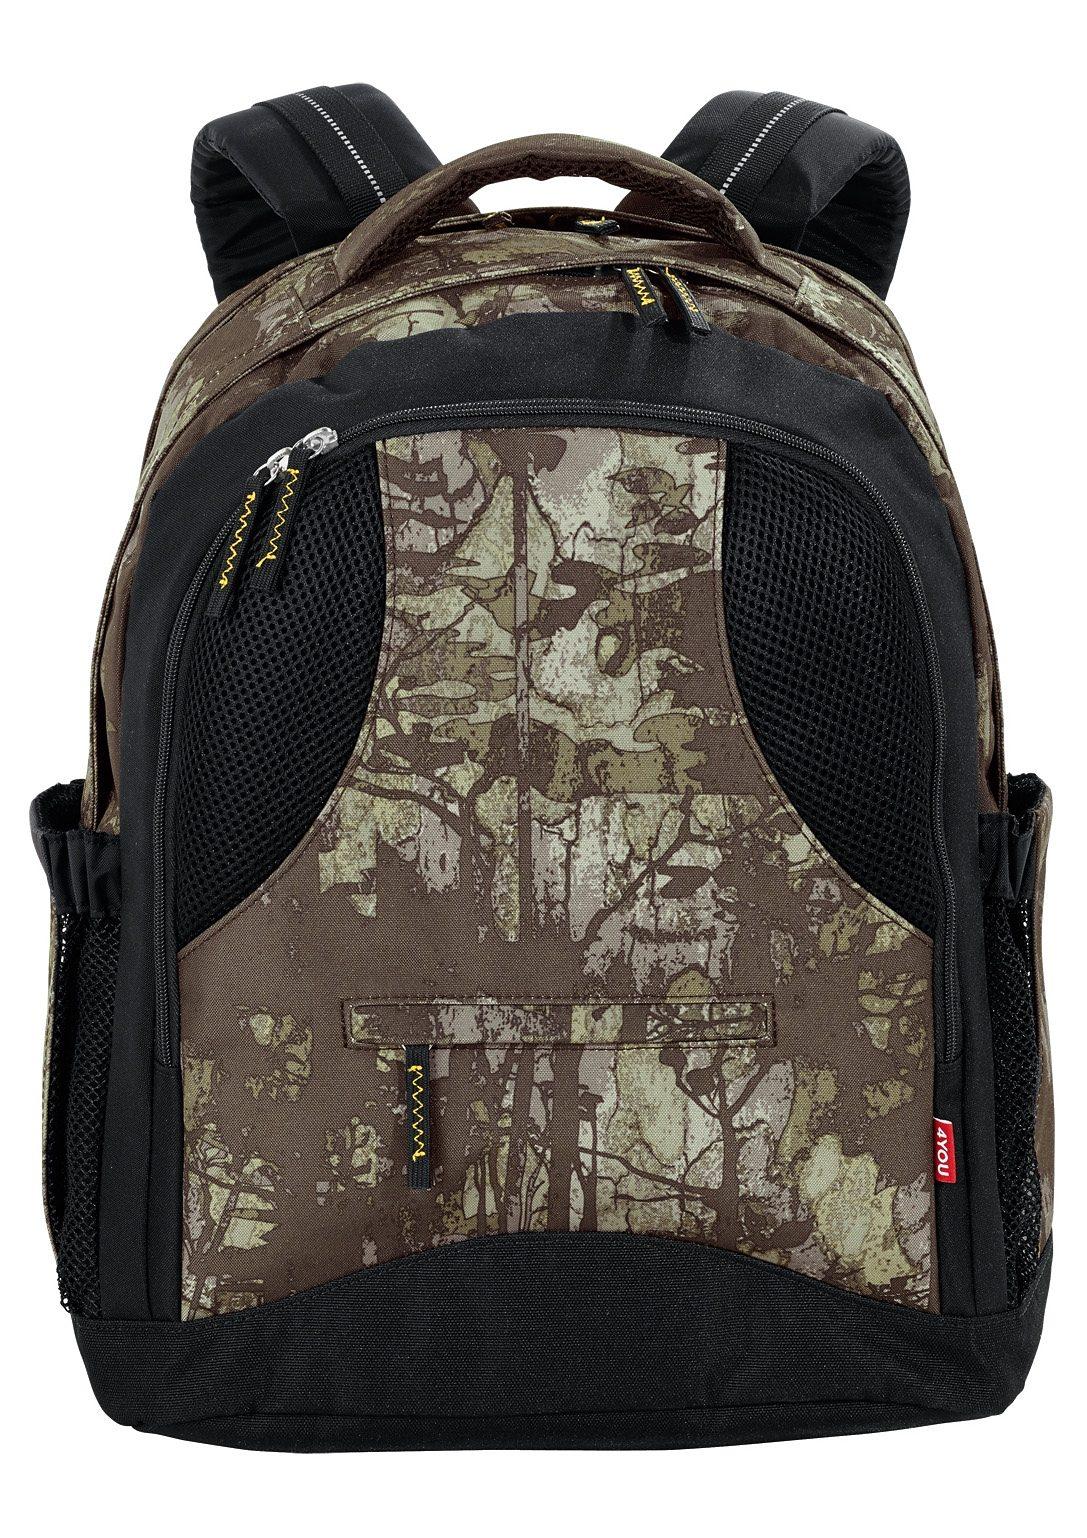 4YOU Schulrucksack mit Laptopfach, Camou Wood, »Compact«